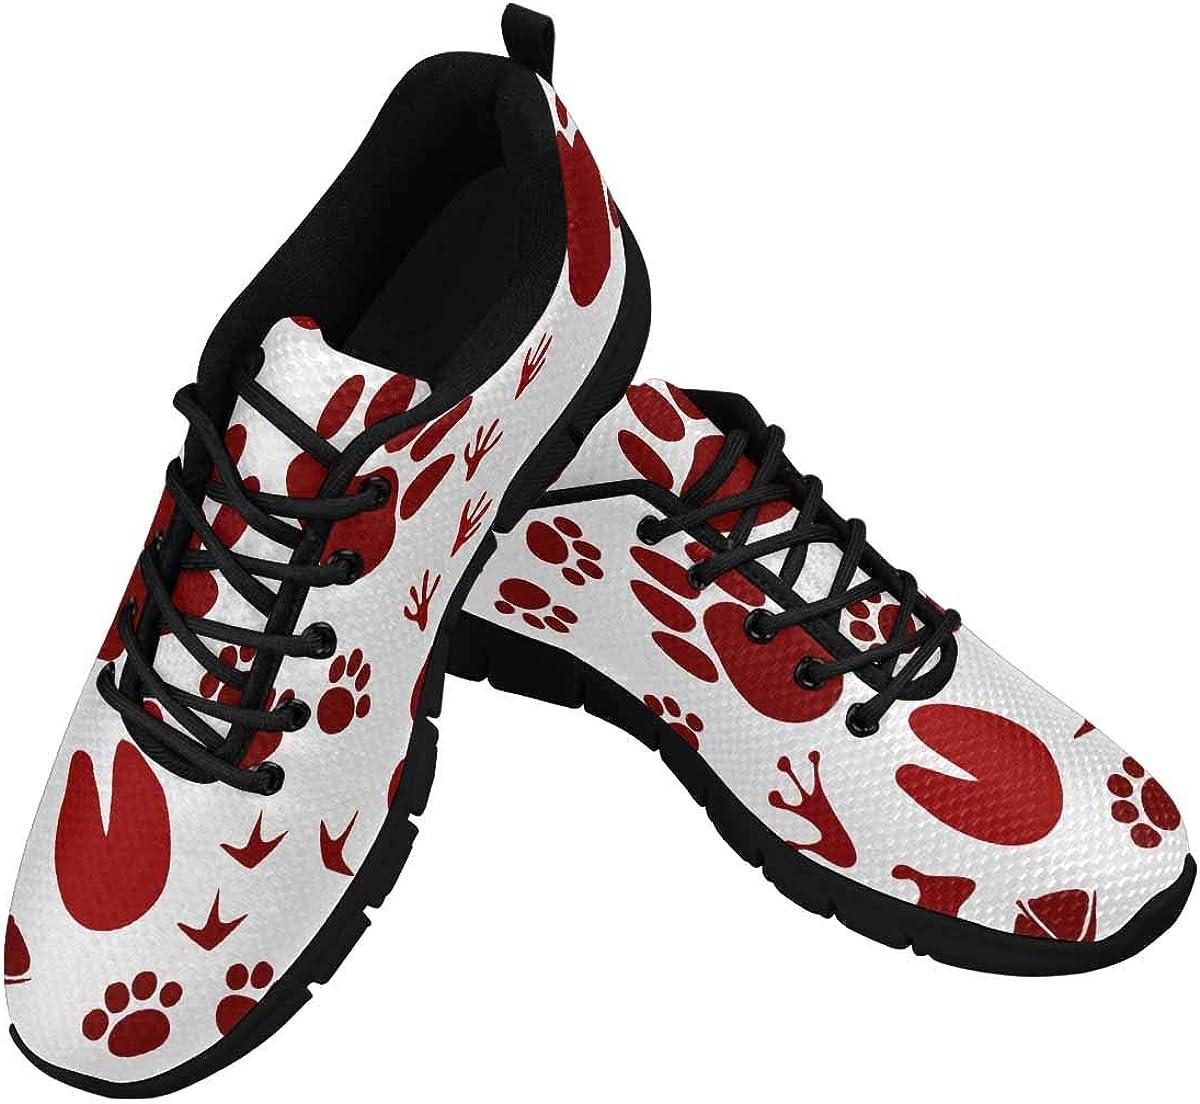 INTERESTPRINT Animal Footprint Track Women's Athletic Walking Shoes Comfort Mesh Non Slip